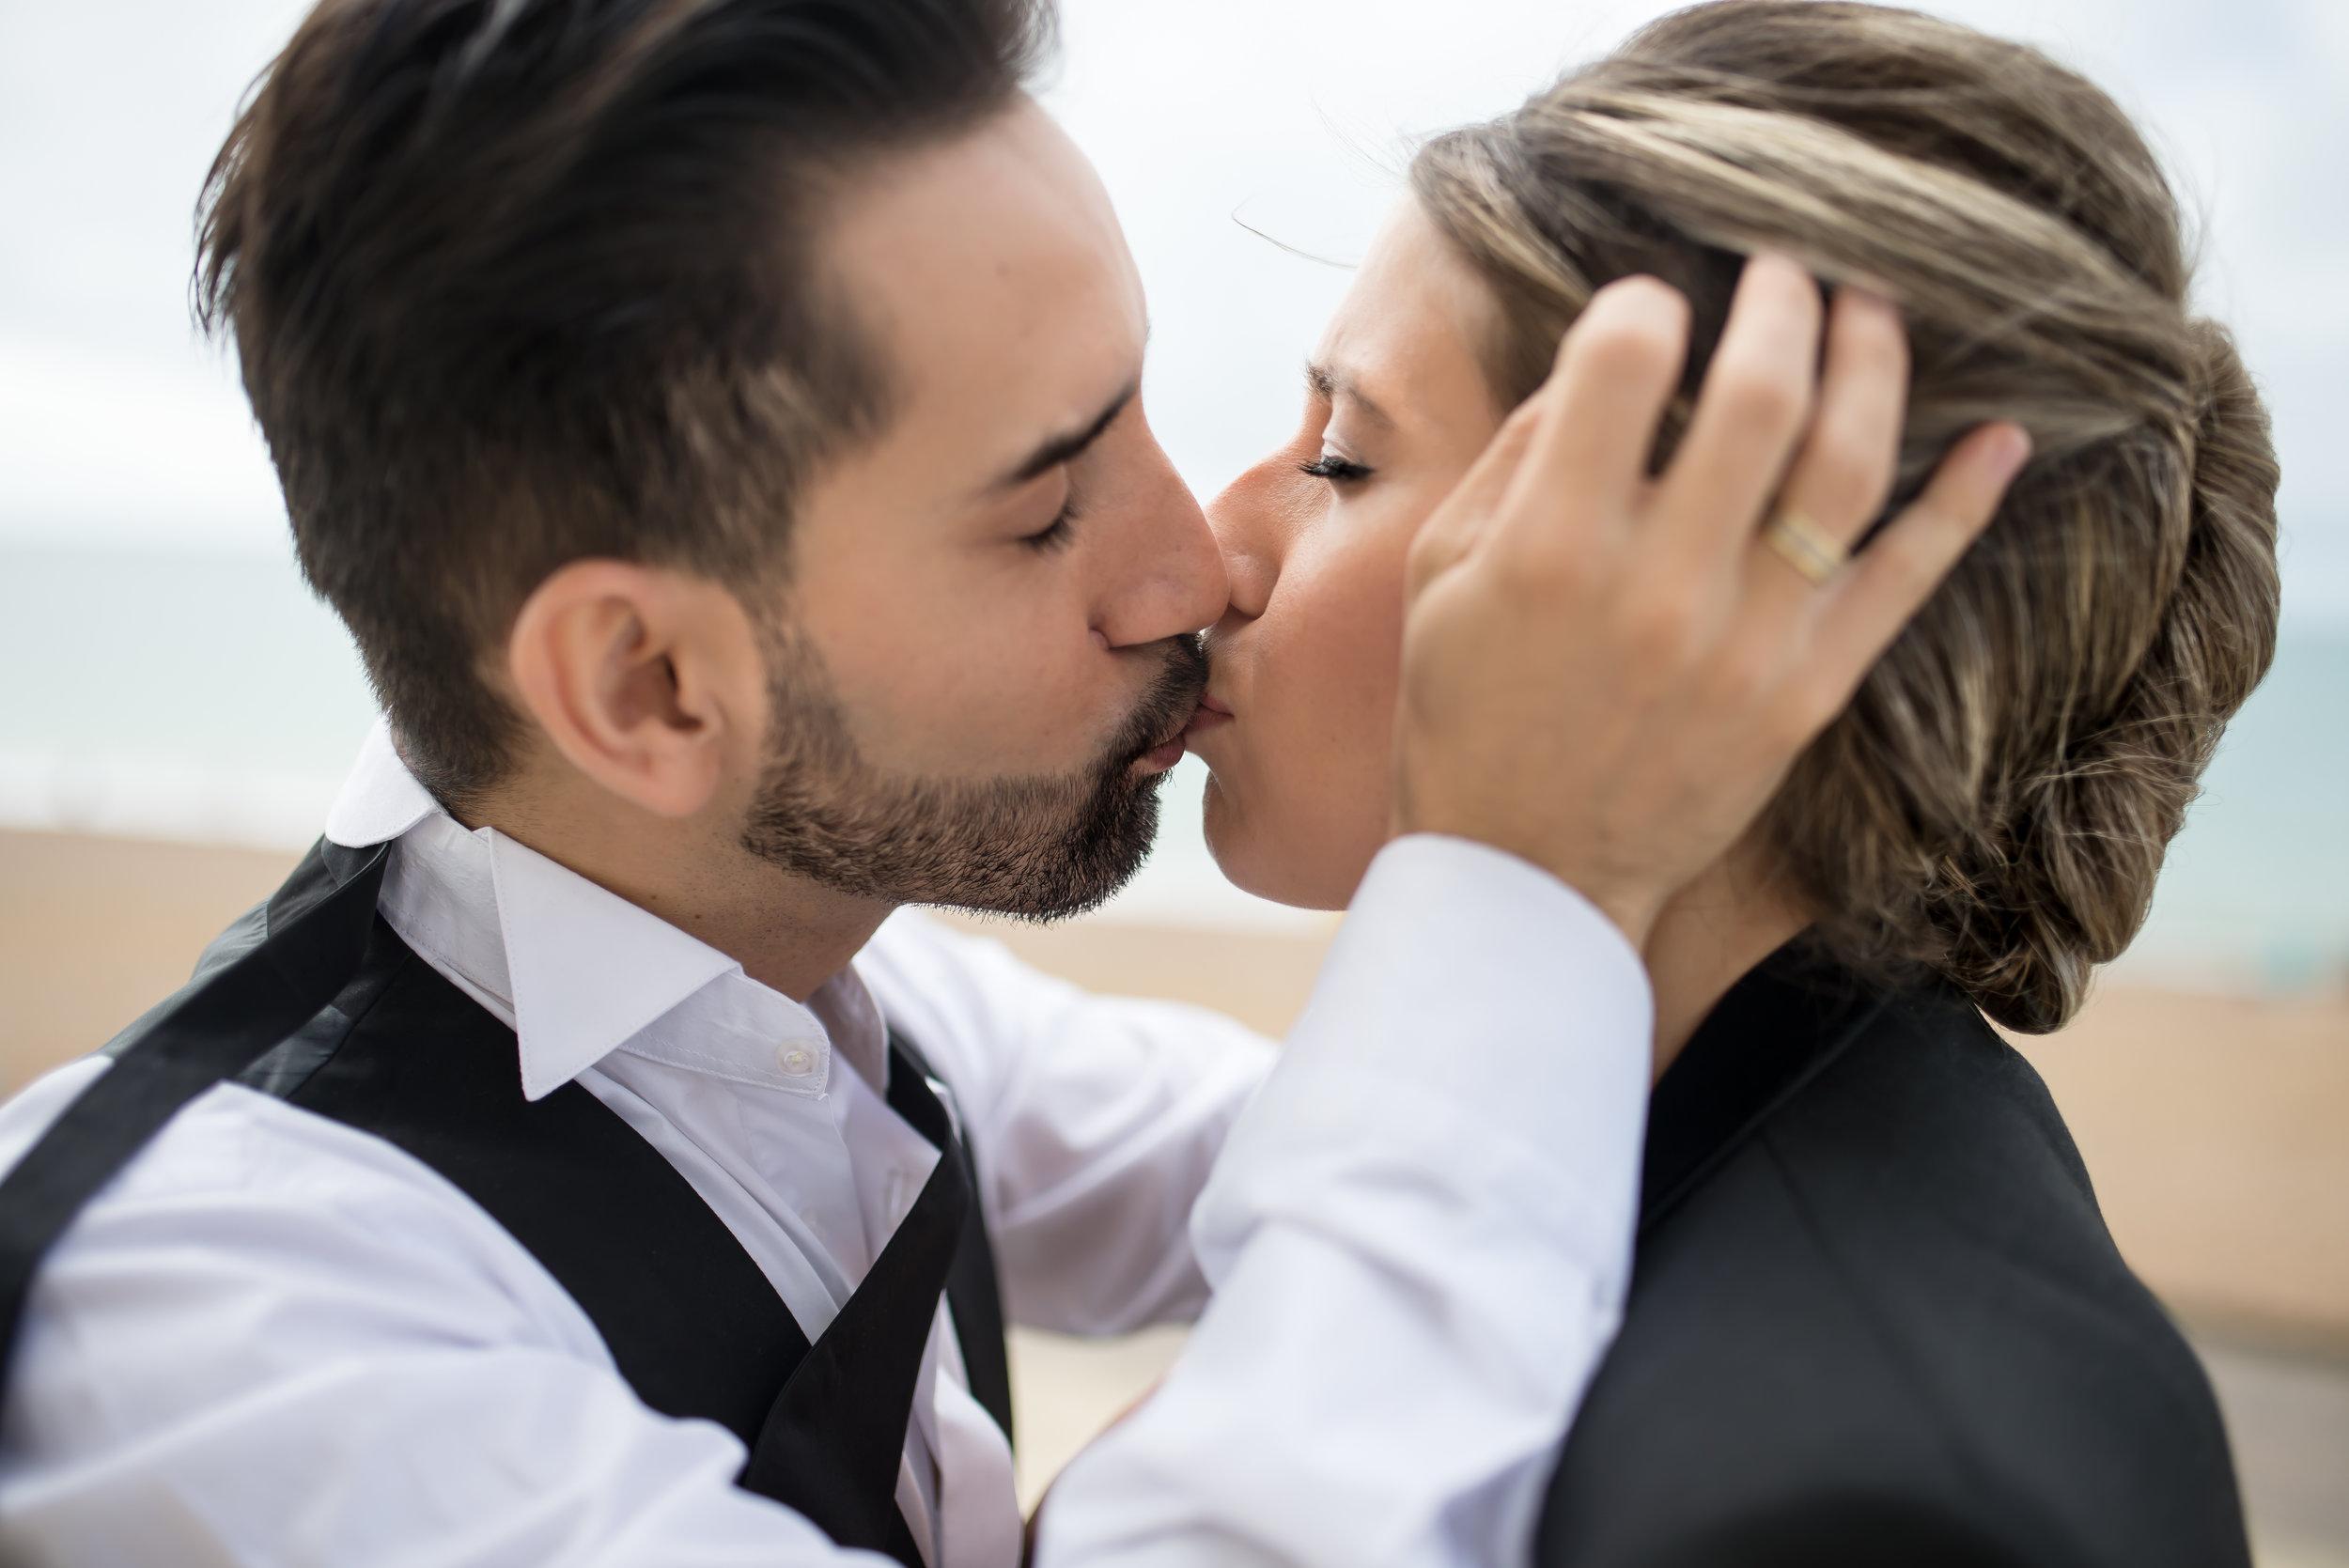 Copy of Stefania and Juan kiss